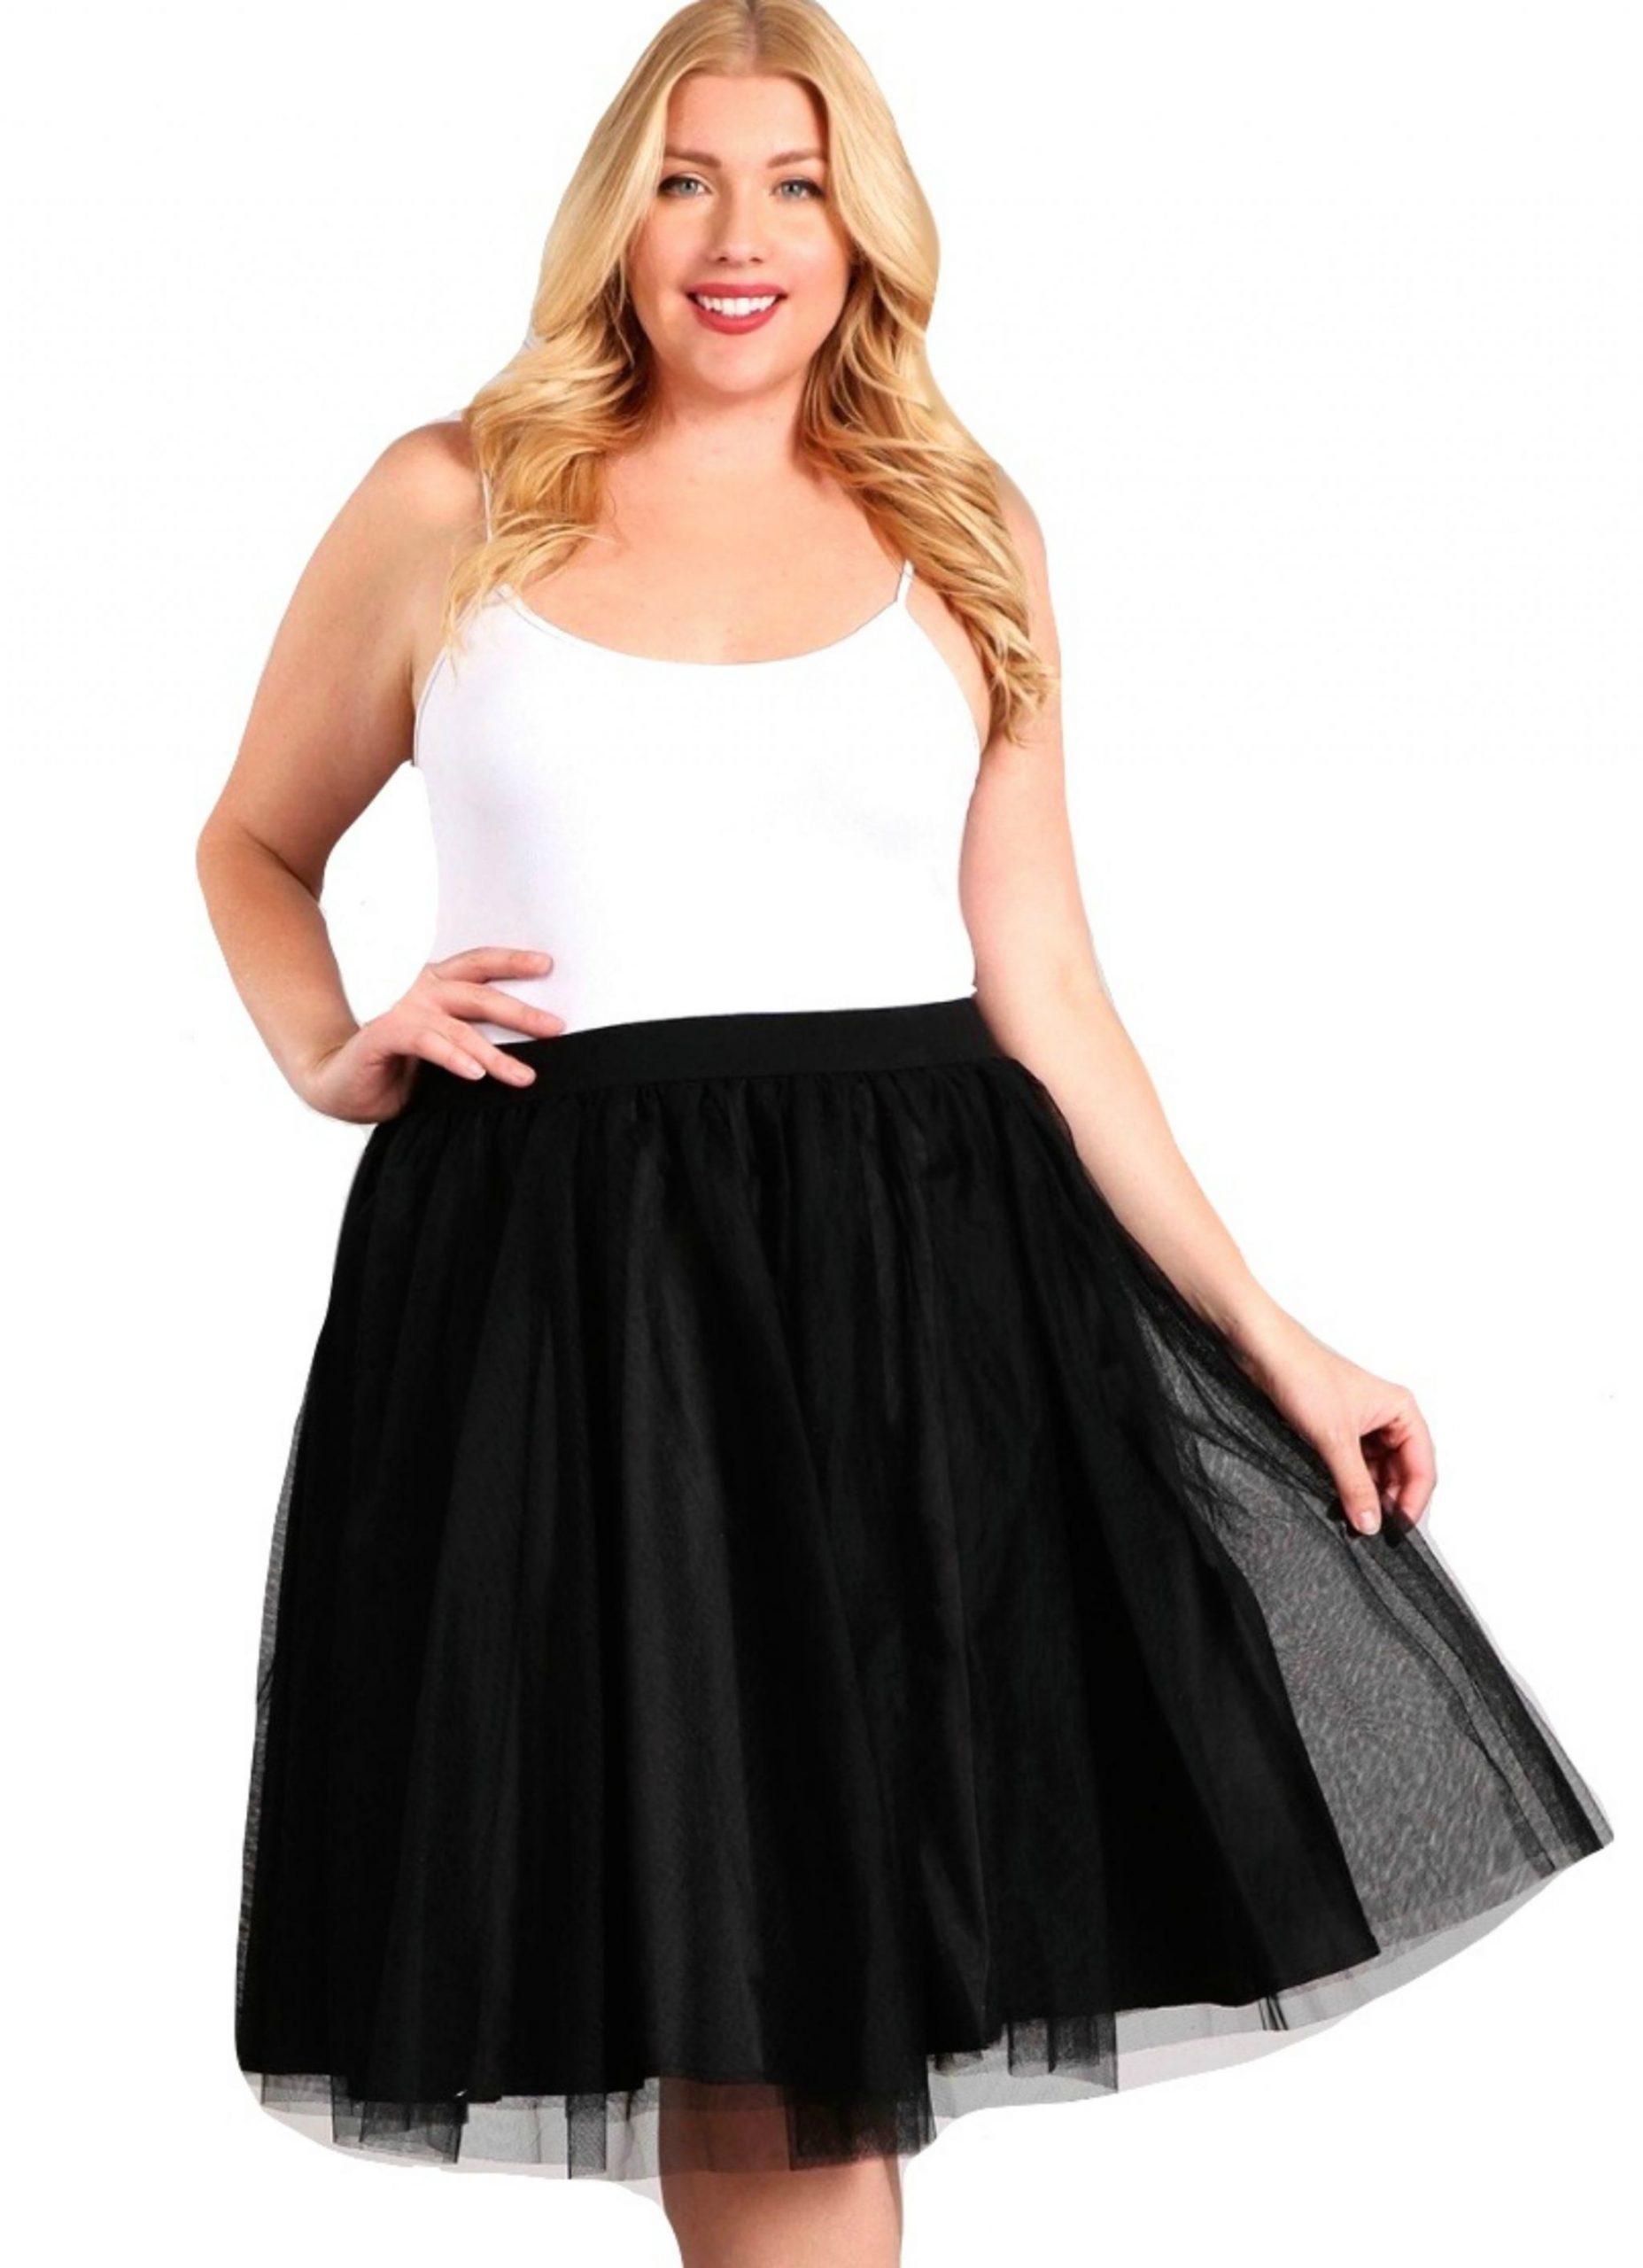 Shop Sweet Dirt women's plus size clothing